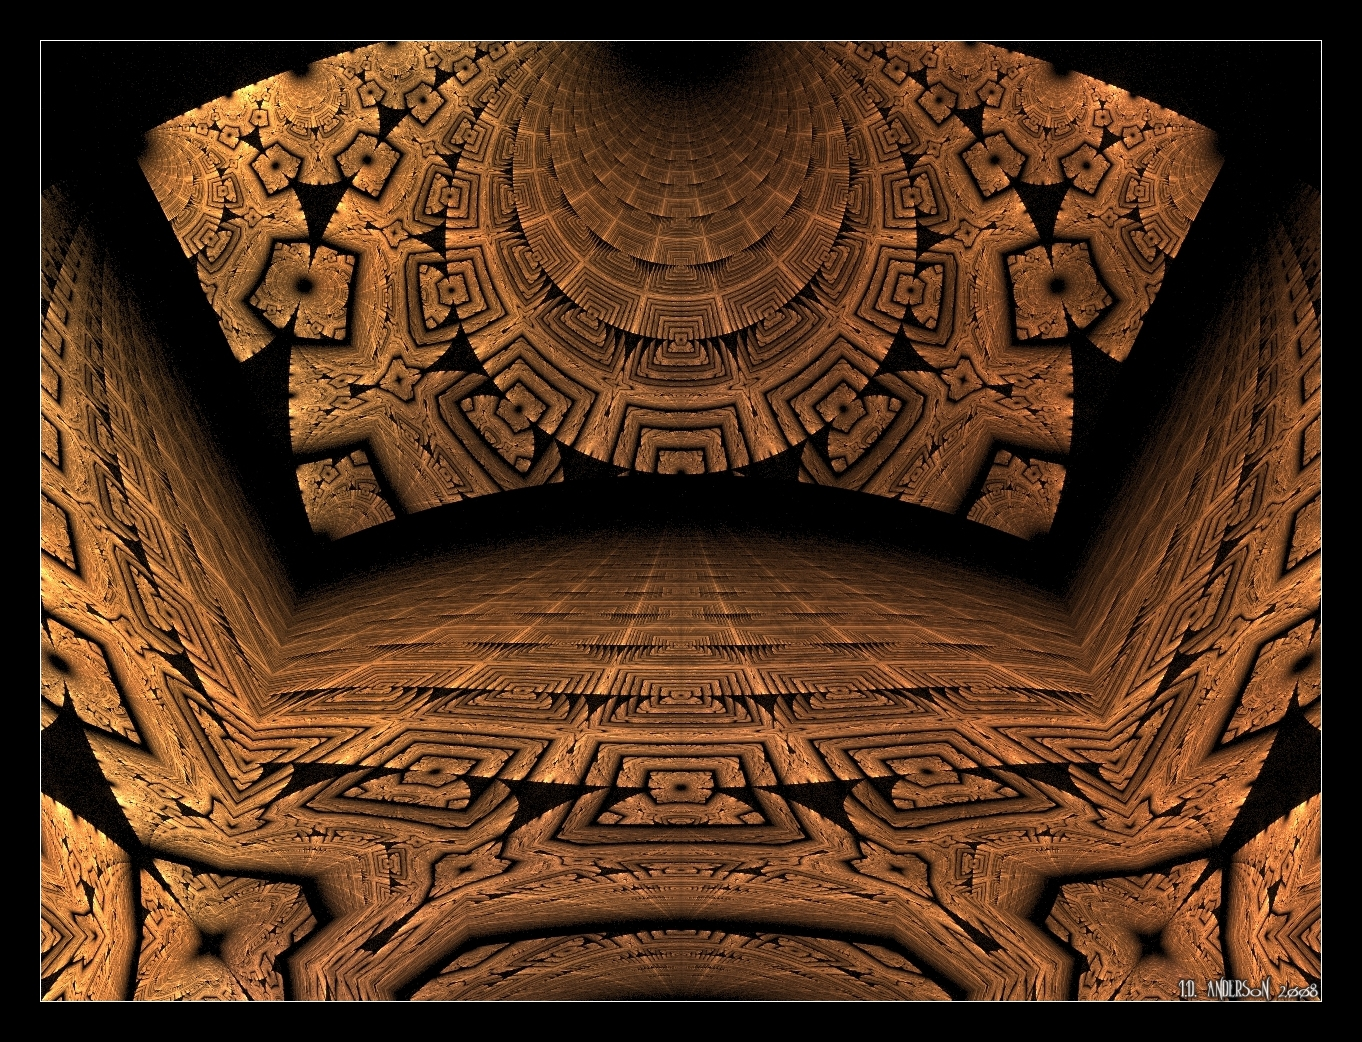 Sanctum sanctorum by IDeviant